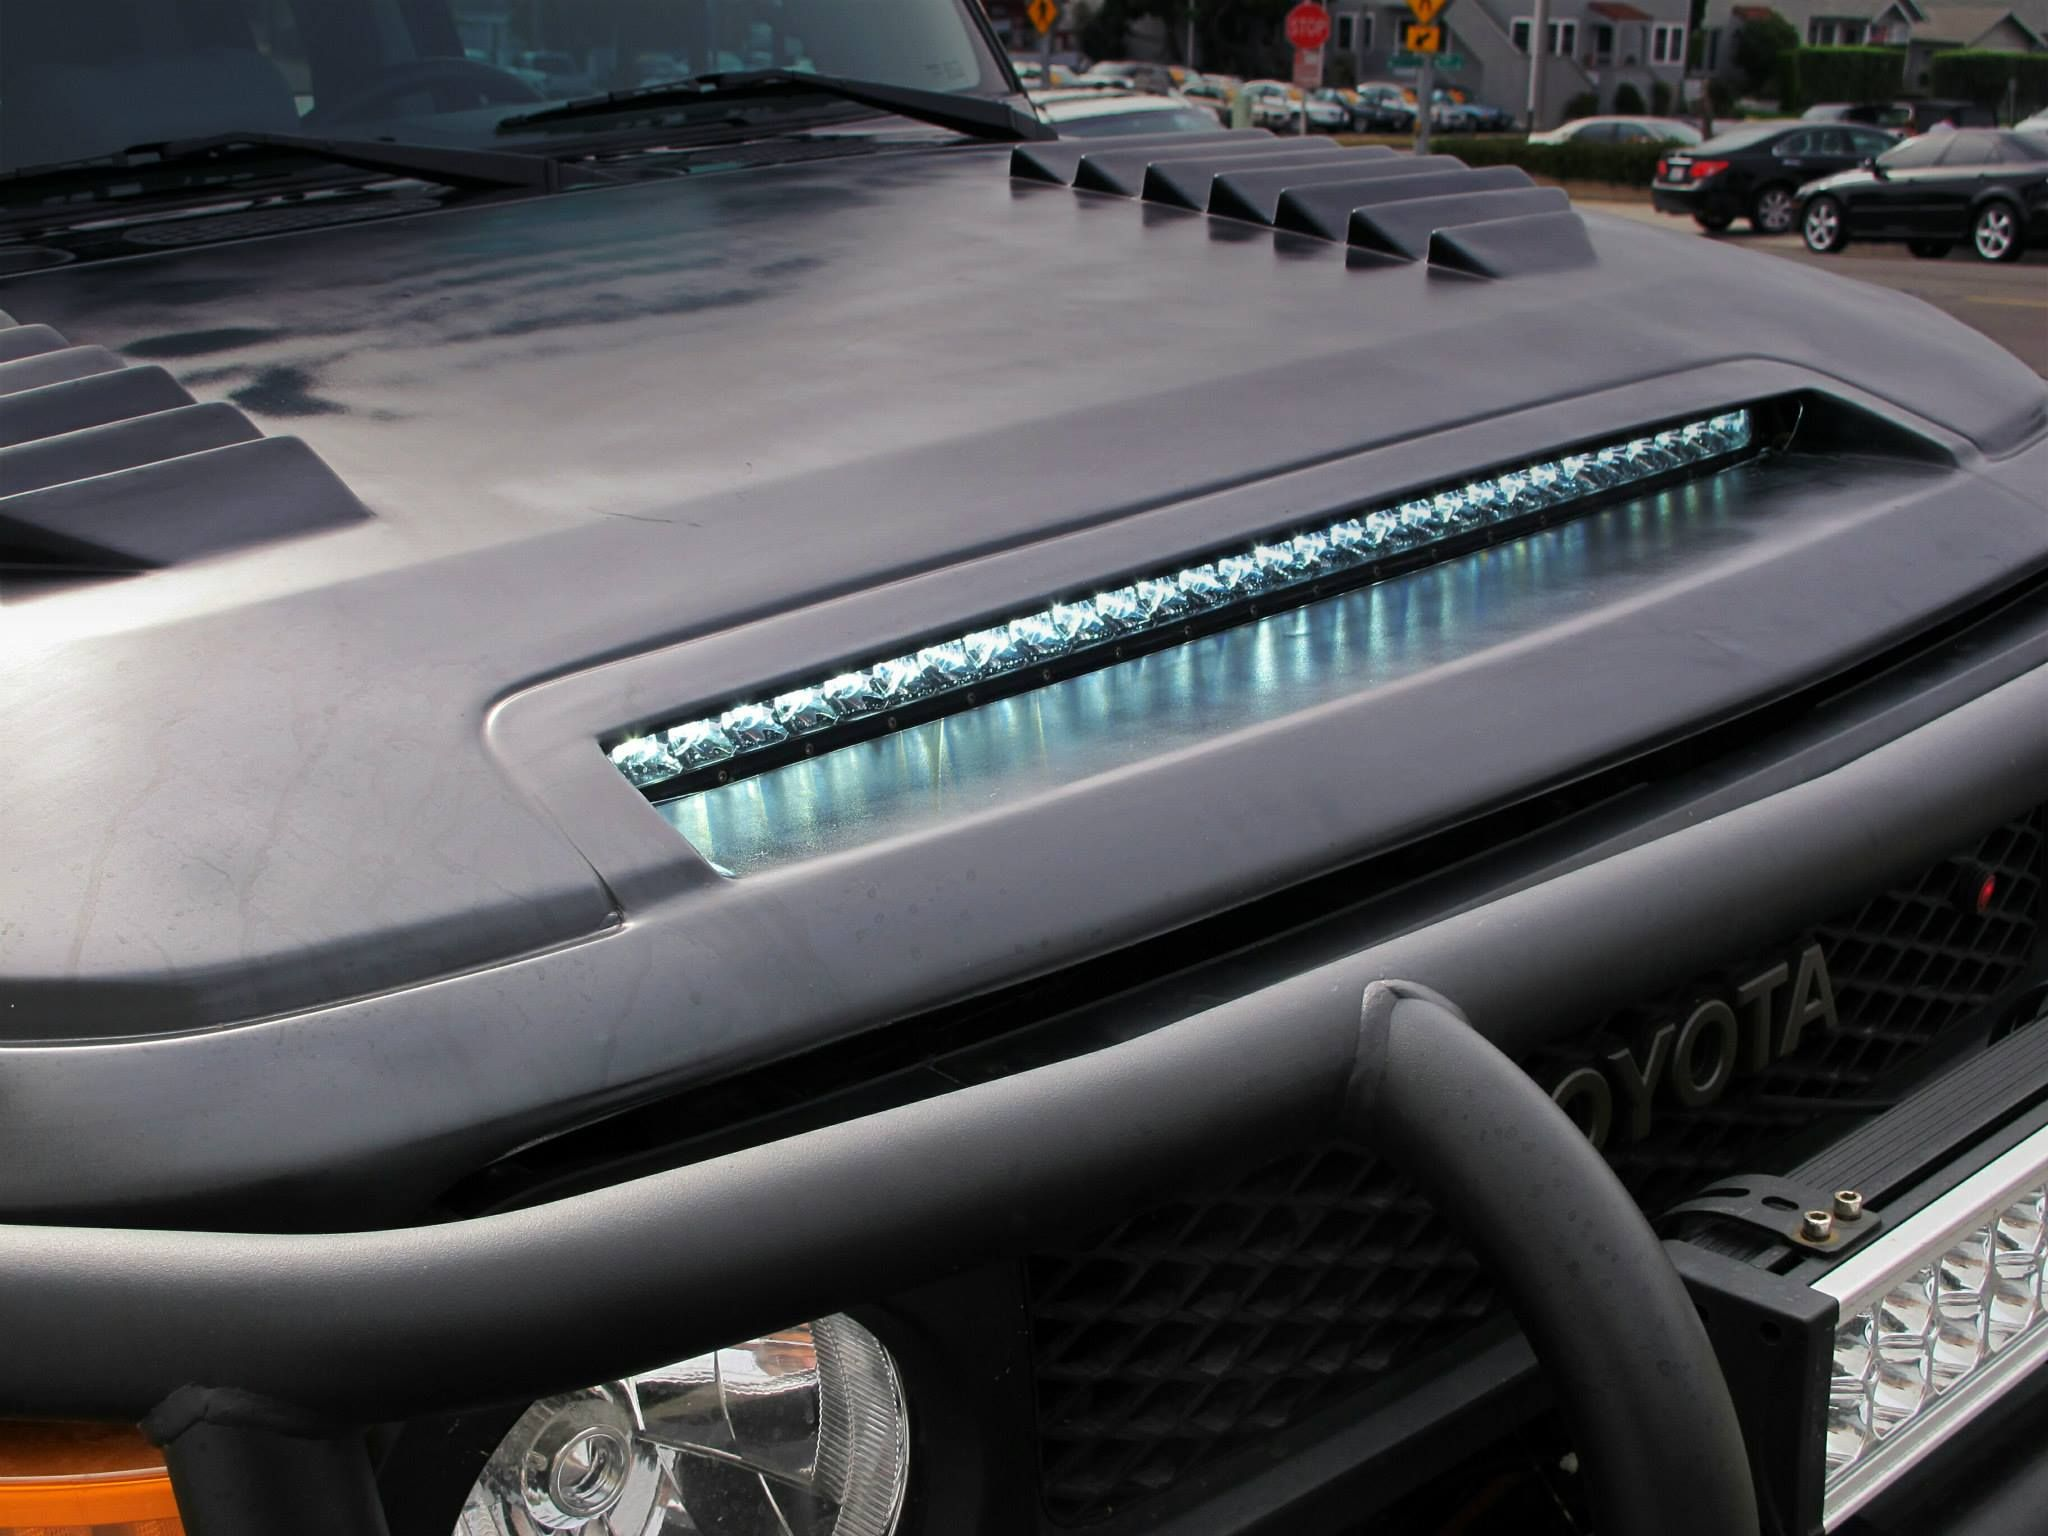 Toyota fj vented aftermarket hood w integrated rigid light spectre toyota fj cruiser